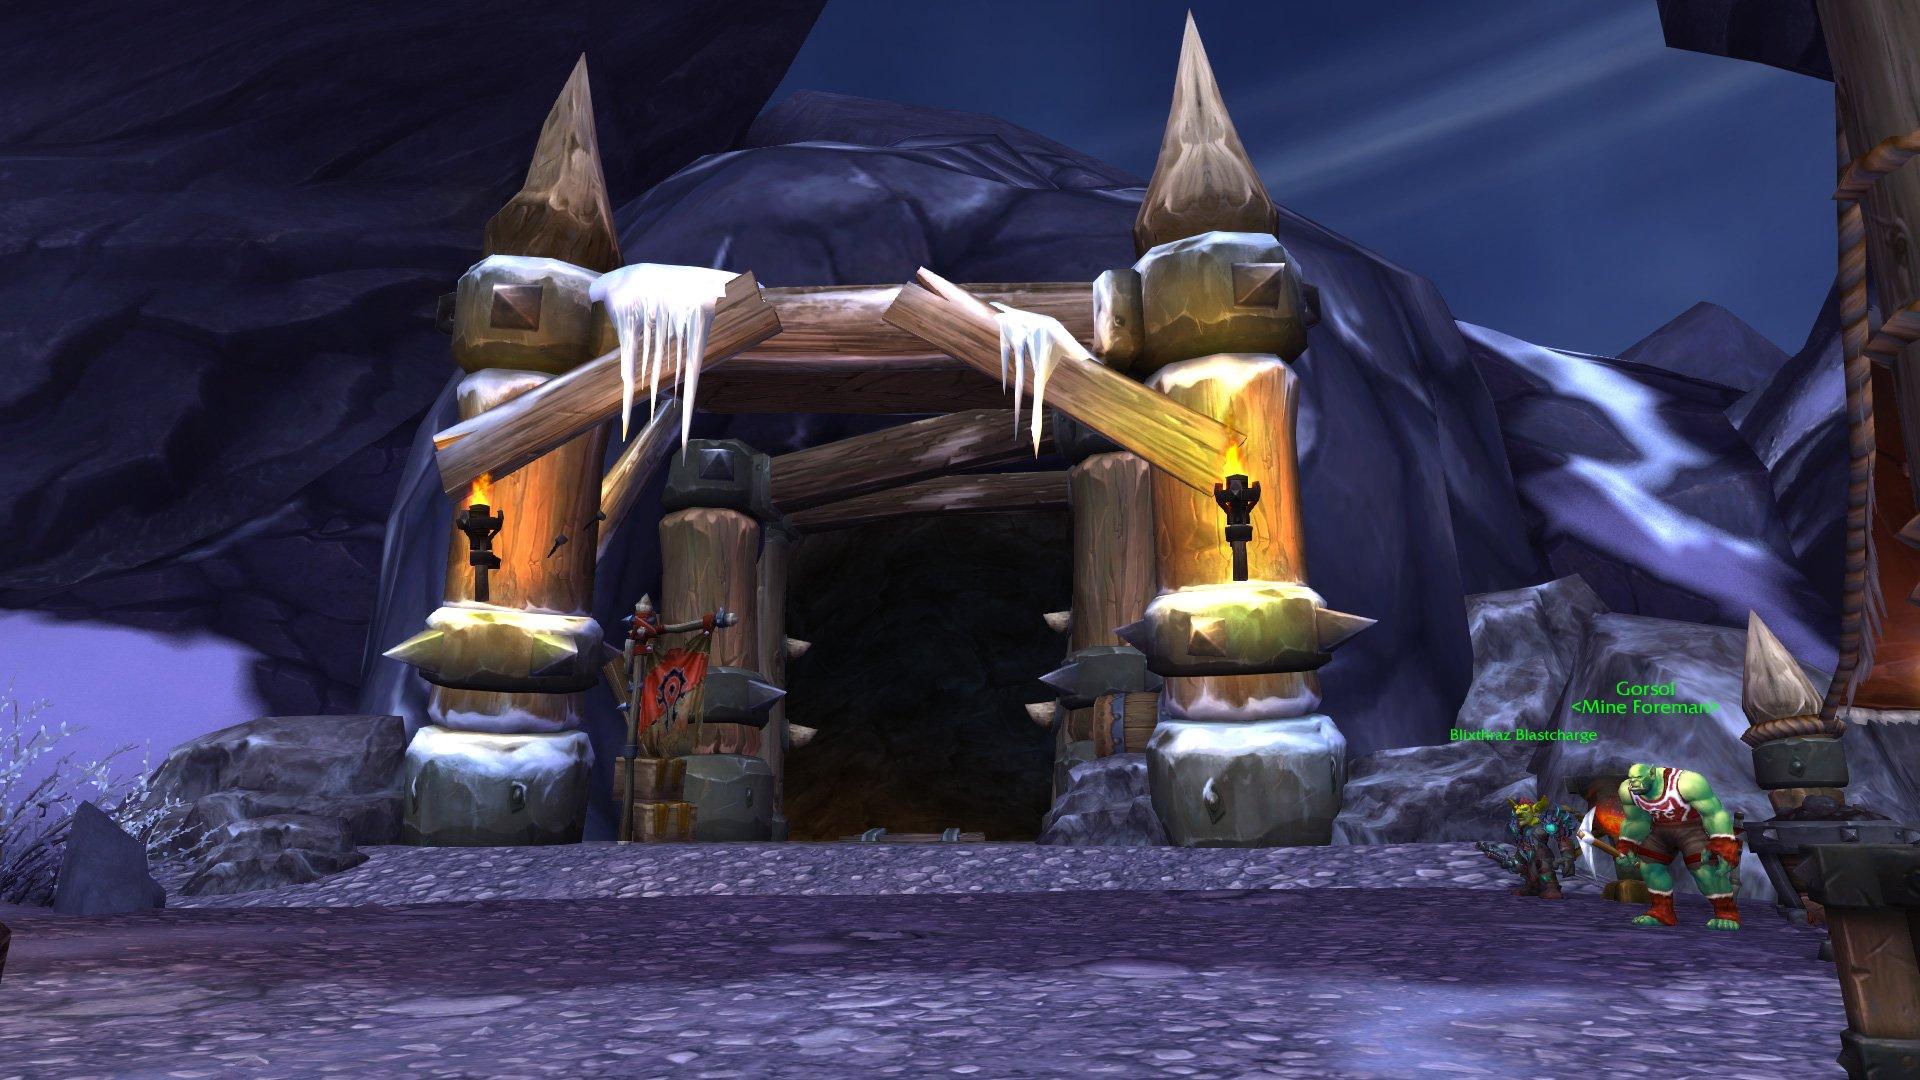 Warlords of draenor garrisons lunarfall excavation frostwall level 1 screenshots level 2 screenshots malvernweather Choice Image